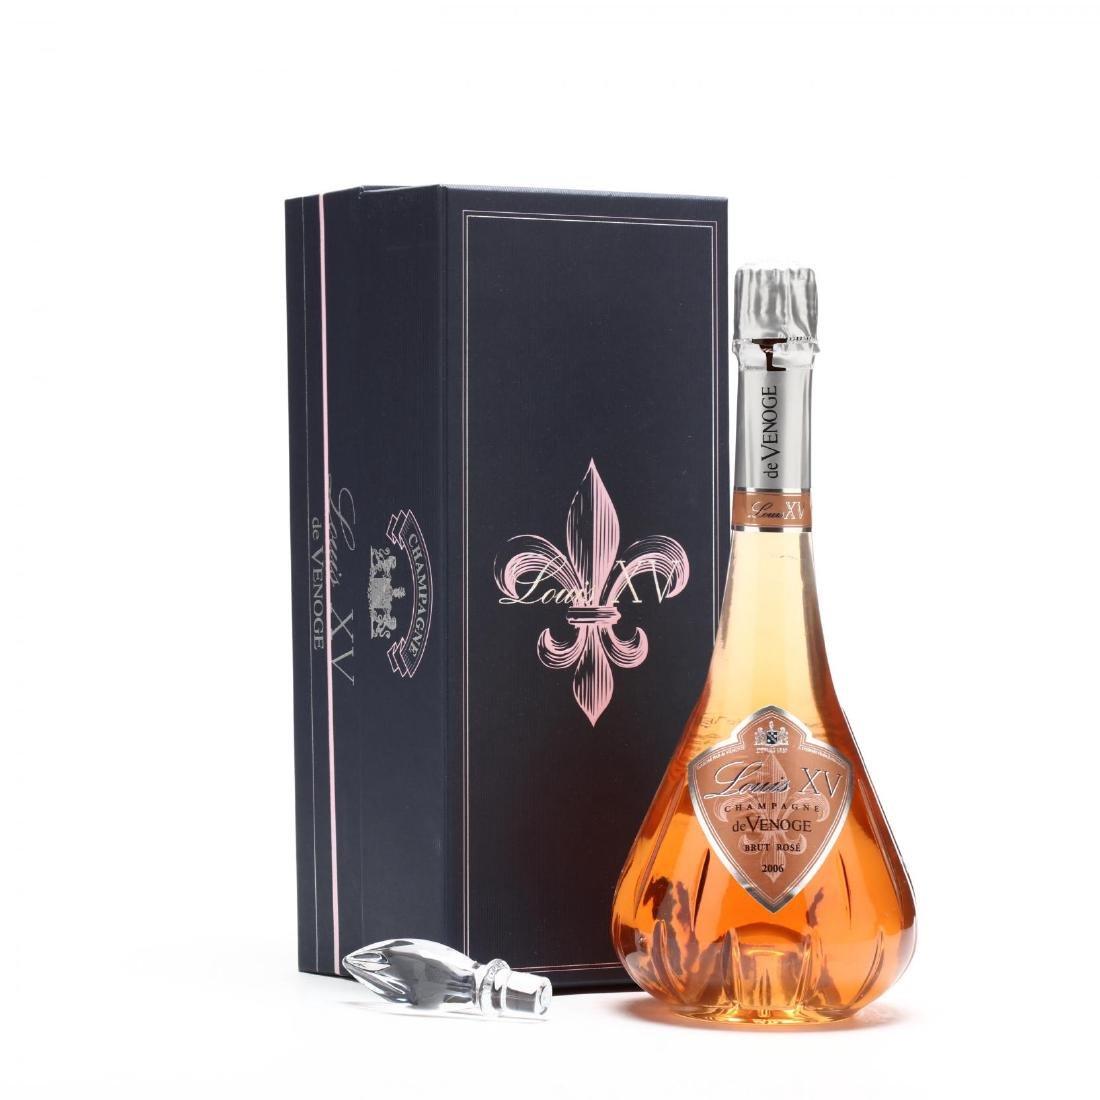 De Venoge Champagne - Vintage 2006